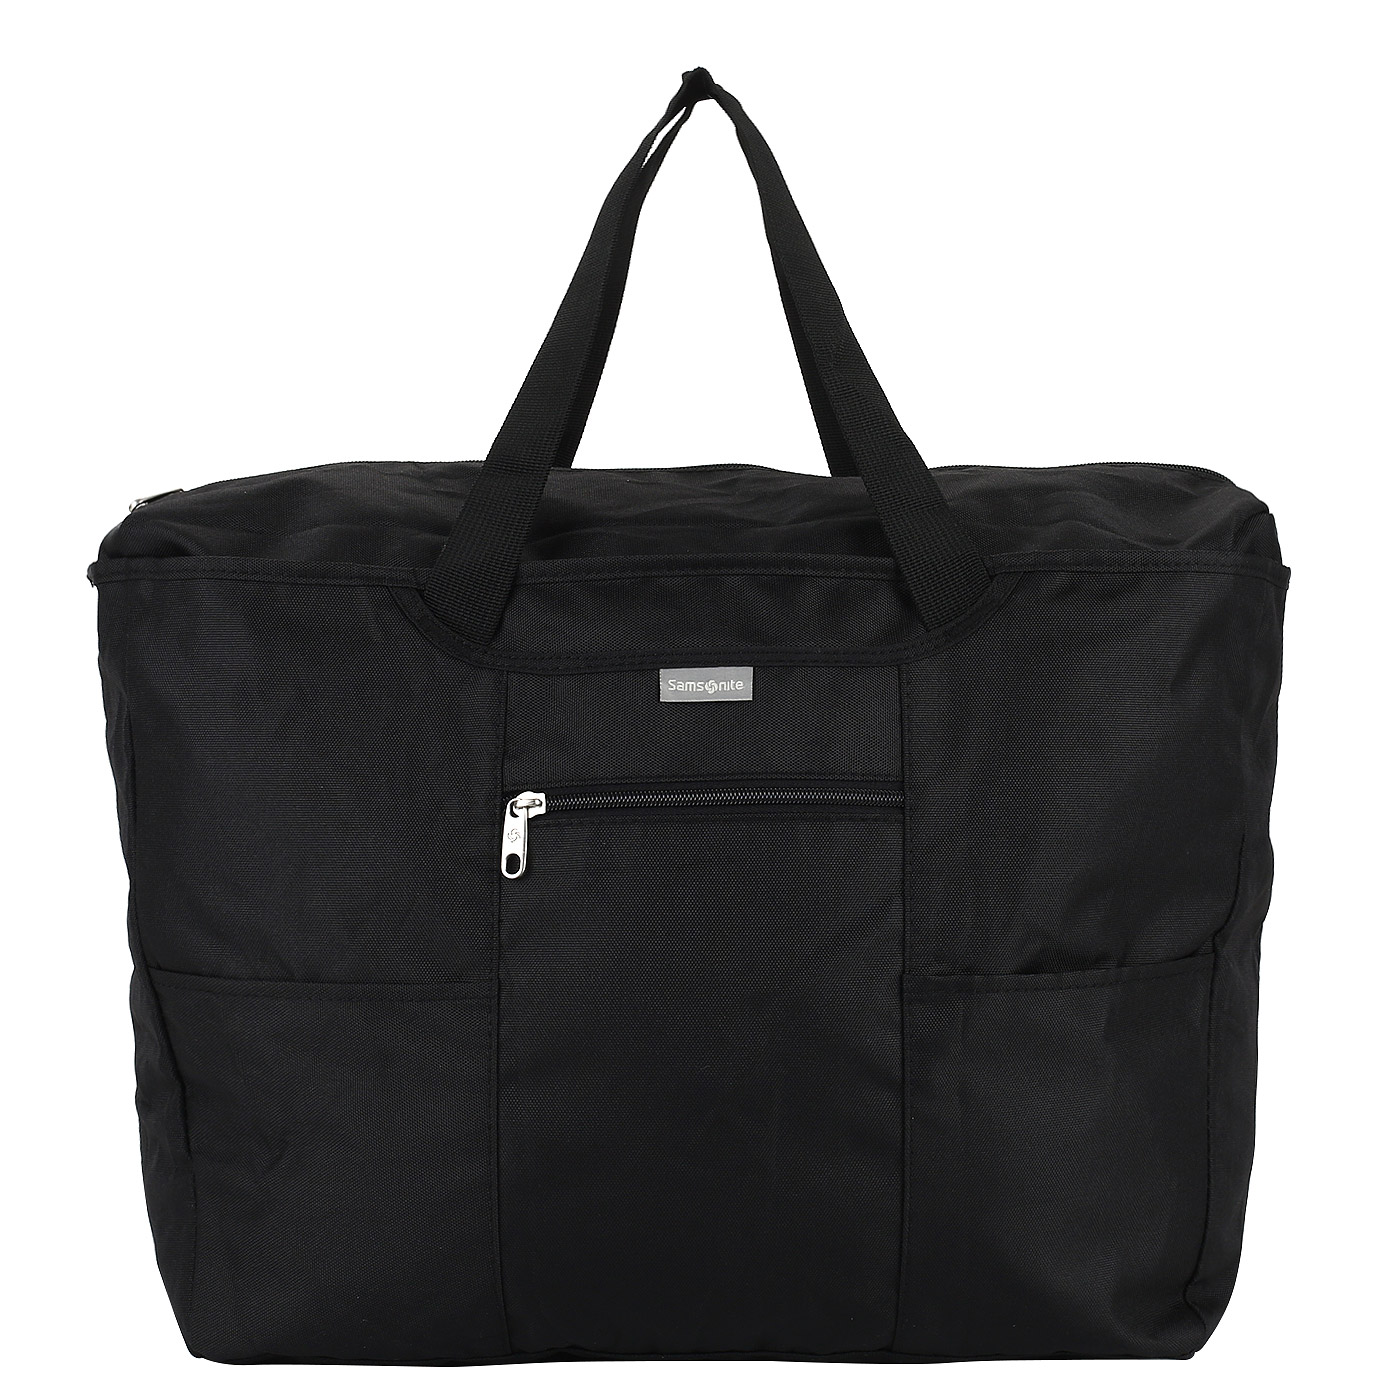 28ada3083ef7 Складная дорожная сумка Samsonite Packing Accessories Складная дорожная  сумка Samsonite Packing Accessories ...